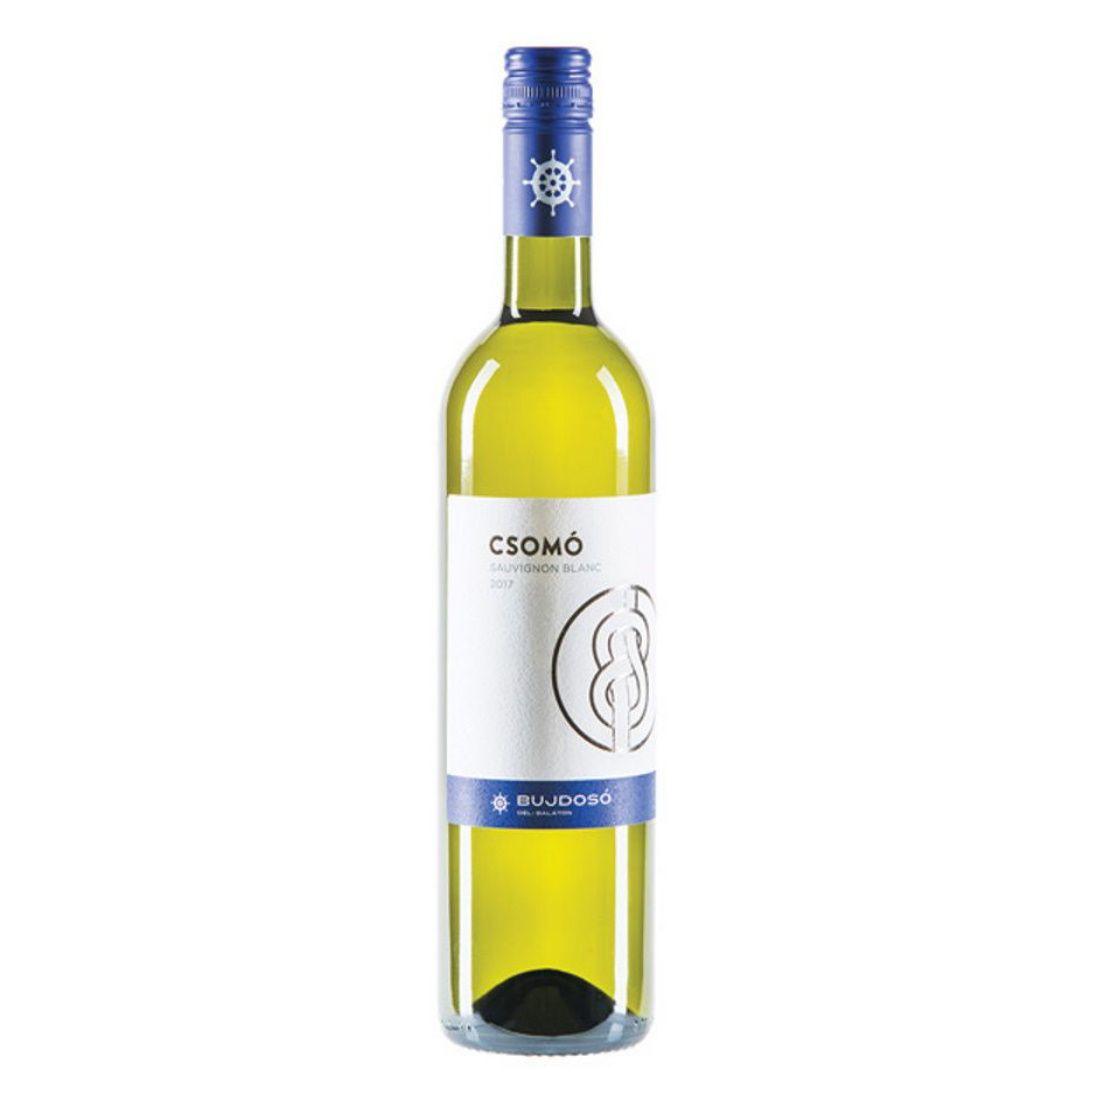 Bujdosó Csomó Sauvignon Blanc 2020 0,75 Balaton